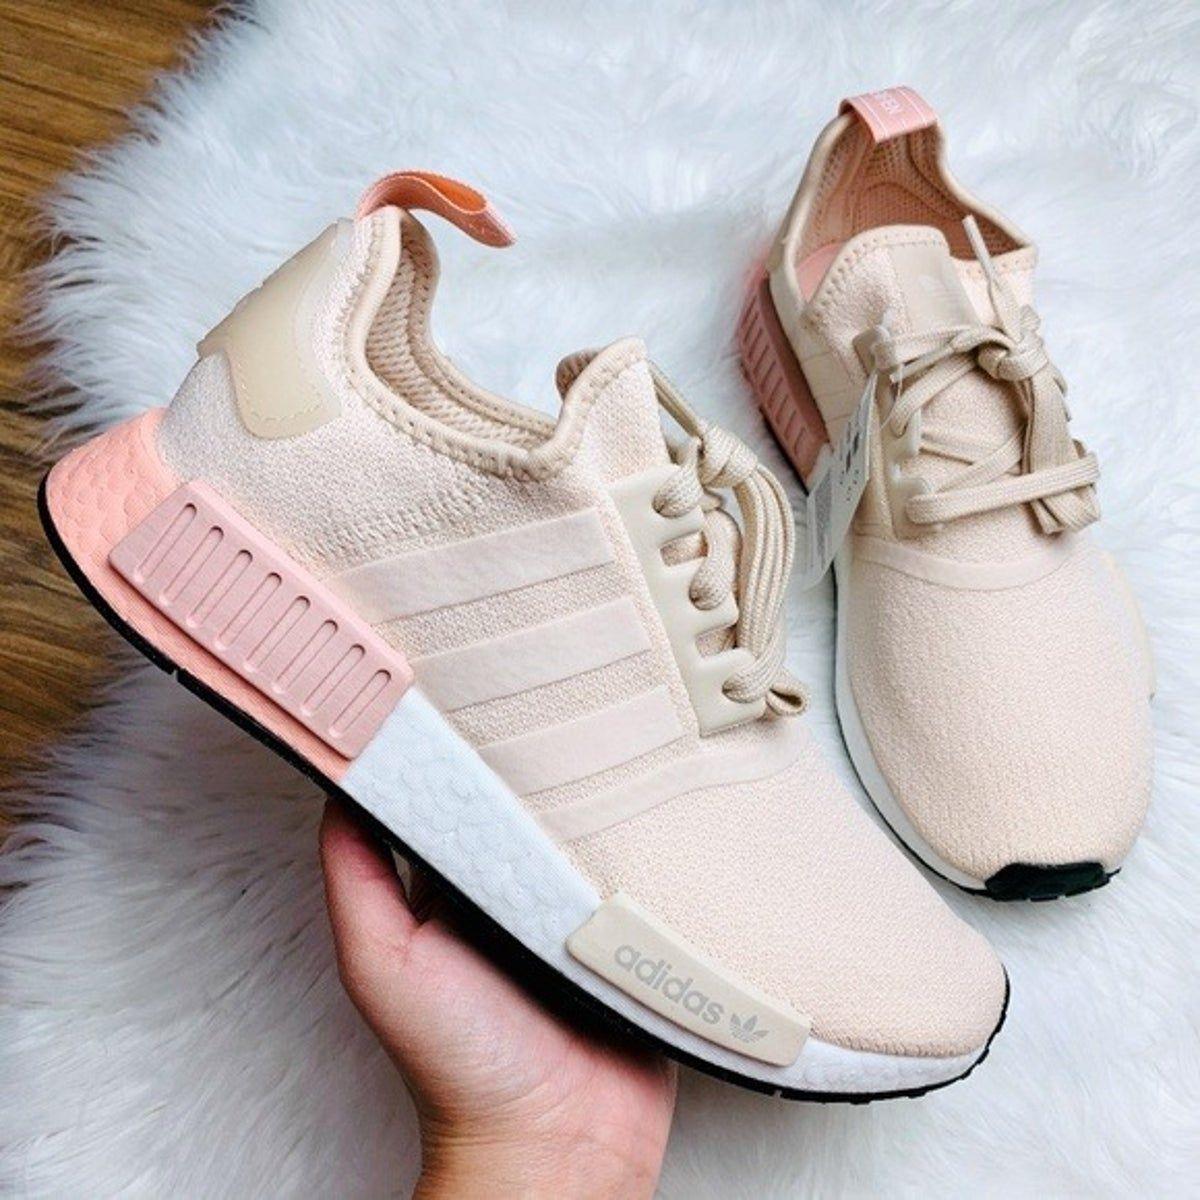 Adidas NMD R1 Linen Vapour Pink | Adidas nmd, Adidas nmd r1 ...